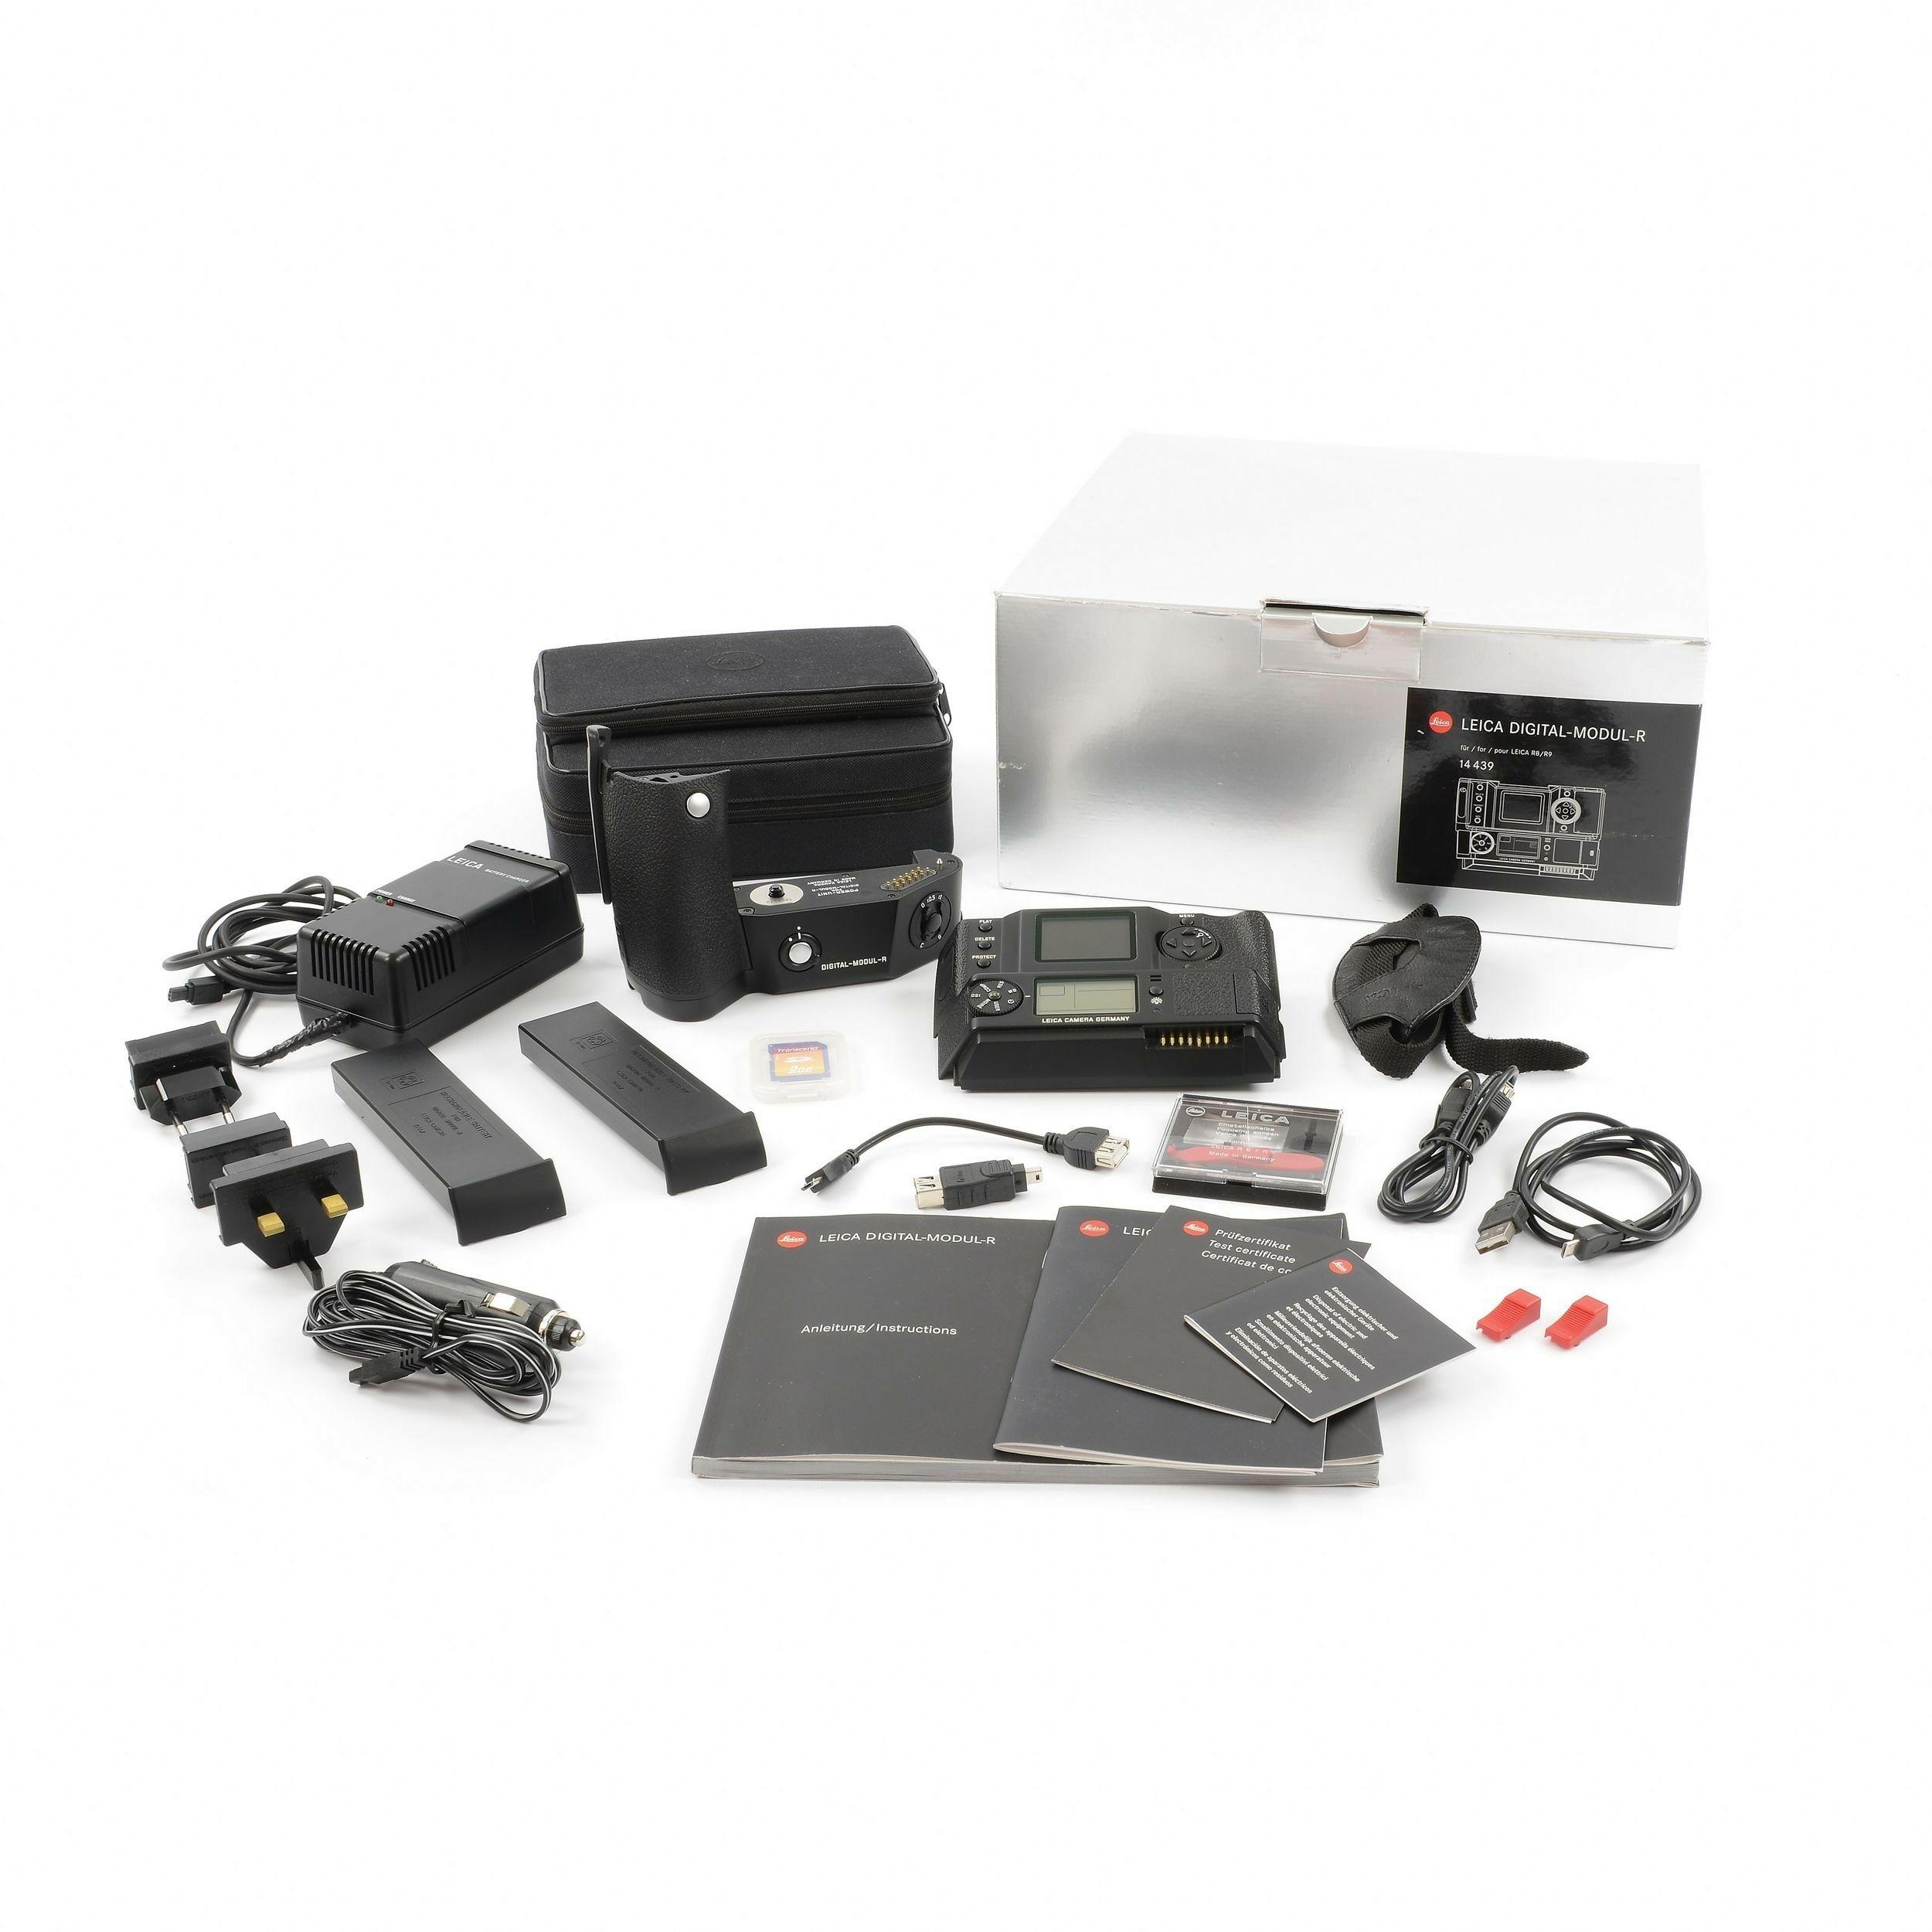 Leica Digital-Modul-R DMR Set + Box